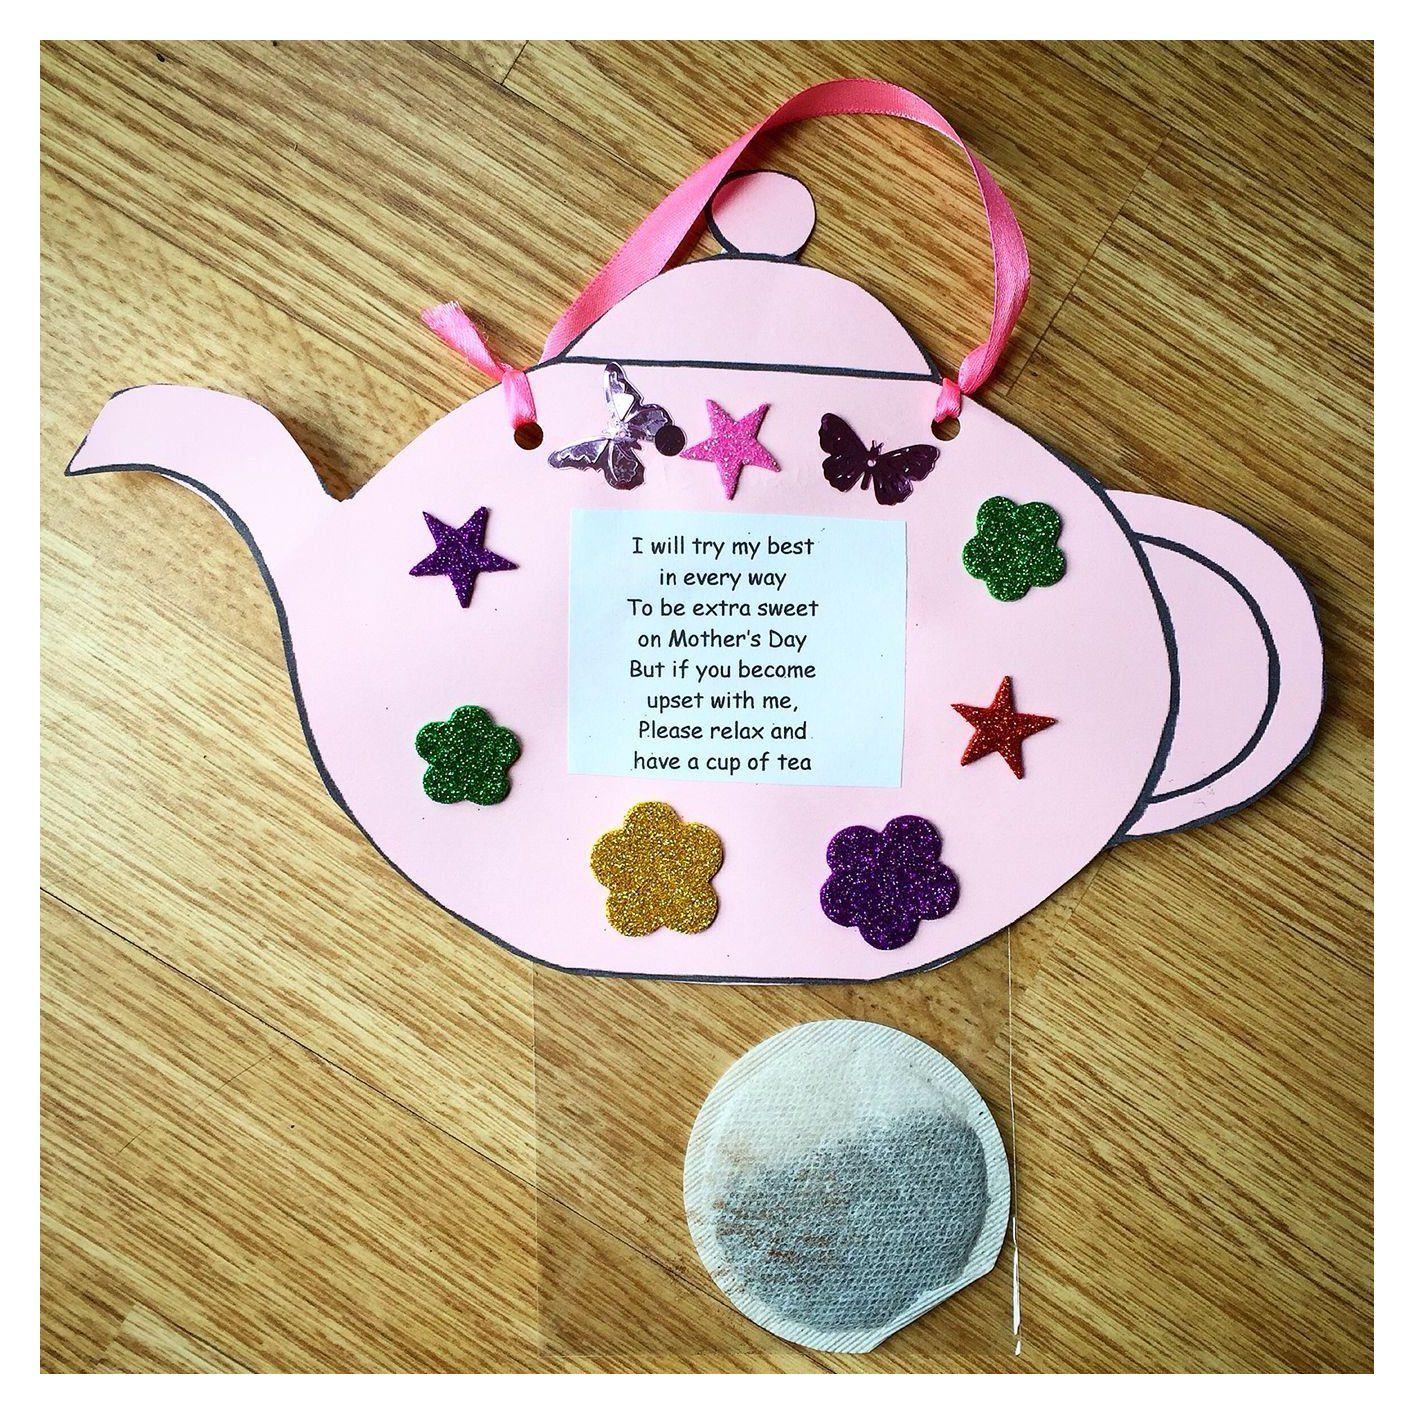 Teapot Craft Preschool Mother S Day Mothers Day Idea Mothers Day Crafts Preschool Mothers Day Crafts For Kids Mothers Day Crafts